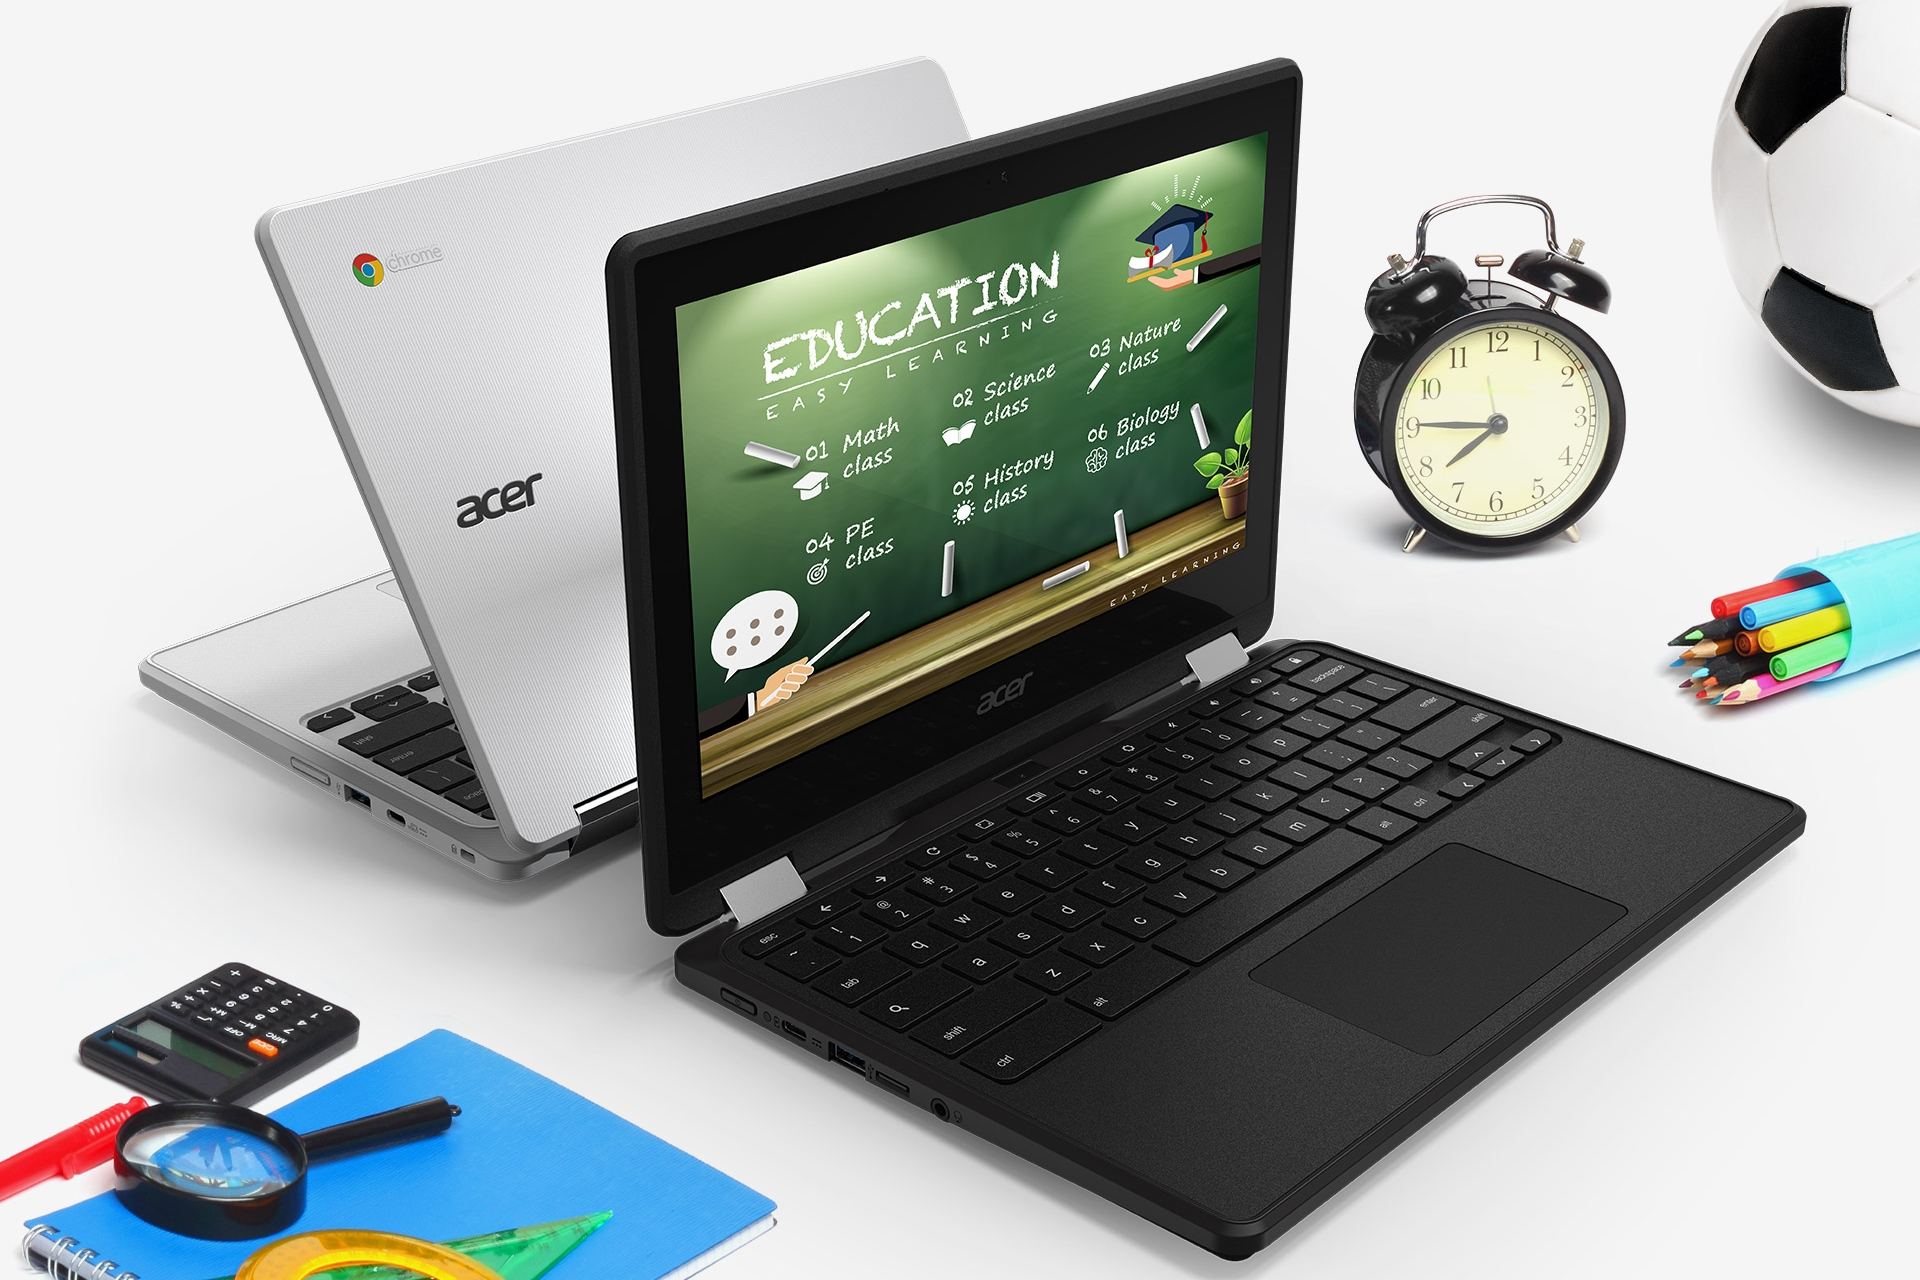 Chromebook_Spin_11_overview_design_large.jpg